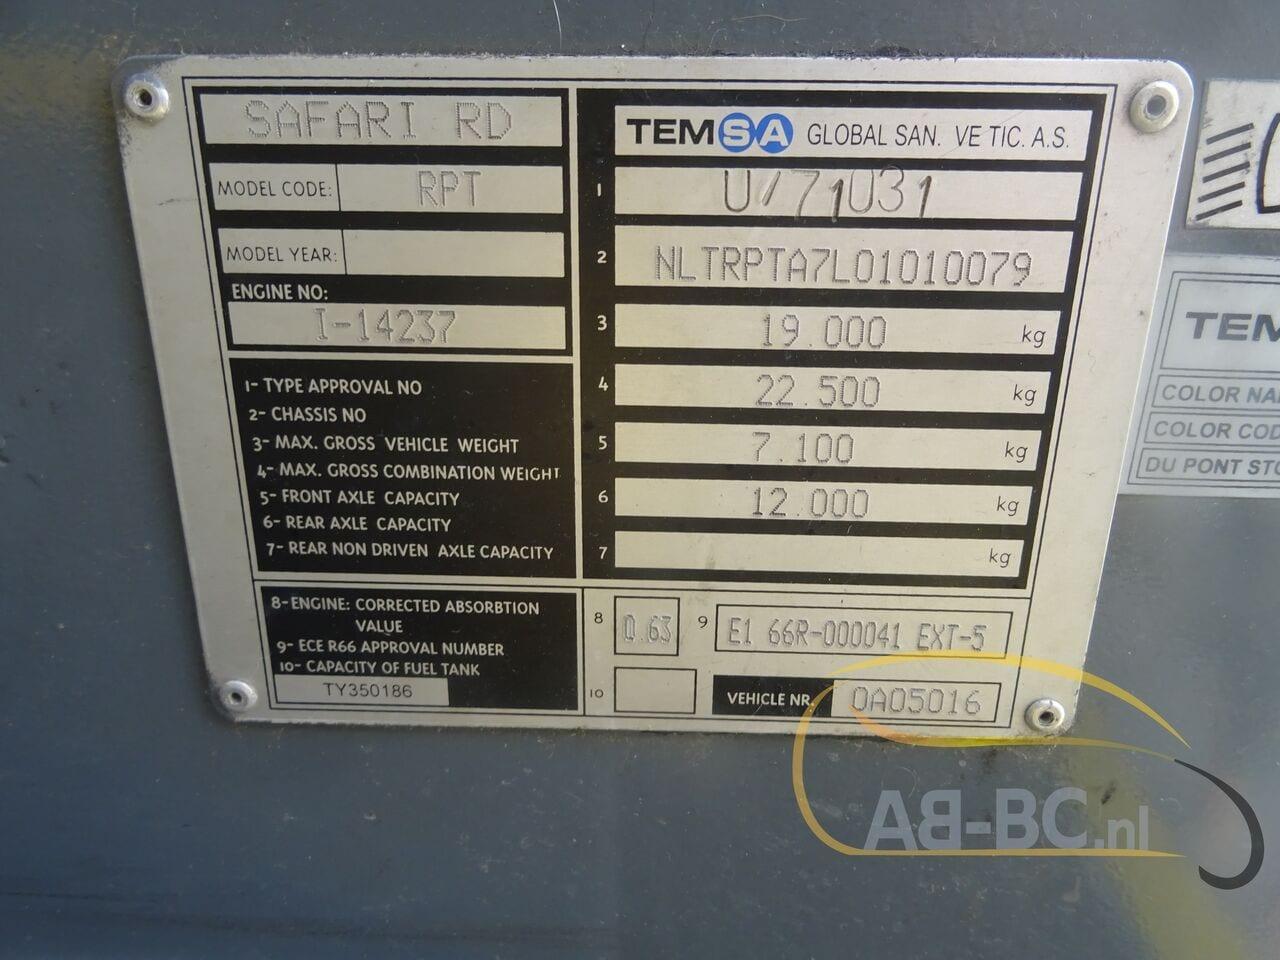 coach-busTEMSA-Safari-RD-DAF-Motor-53-Seats-Euro-5---1623932367095602853_big_7d6926b4af1d8b216f55f15a1fb184be--21061715155620919600